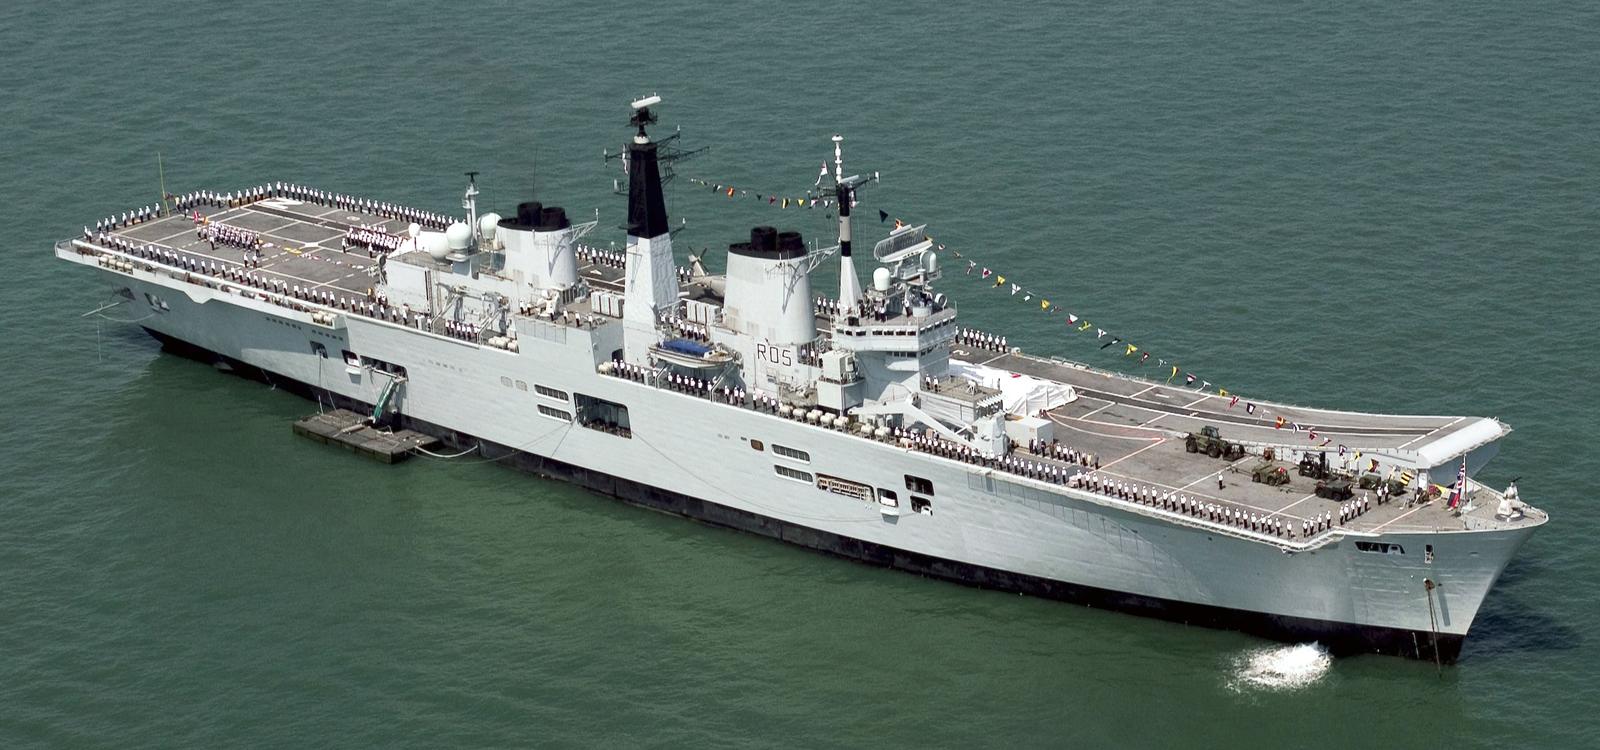 The Falklands War Almost Had The World's First Modern Aircraft Carrier Battle